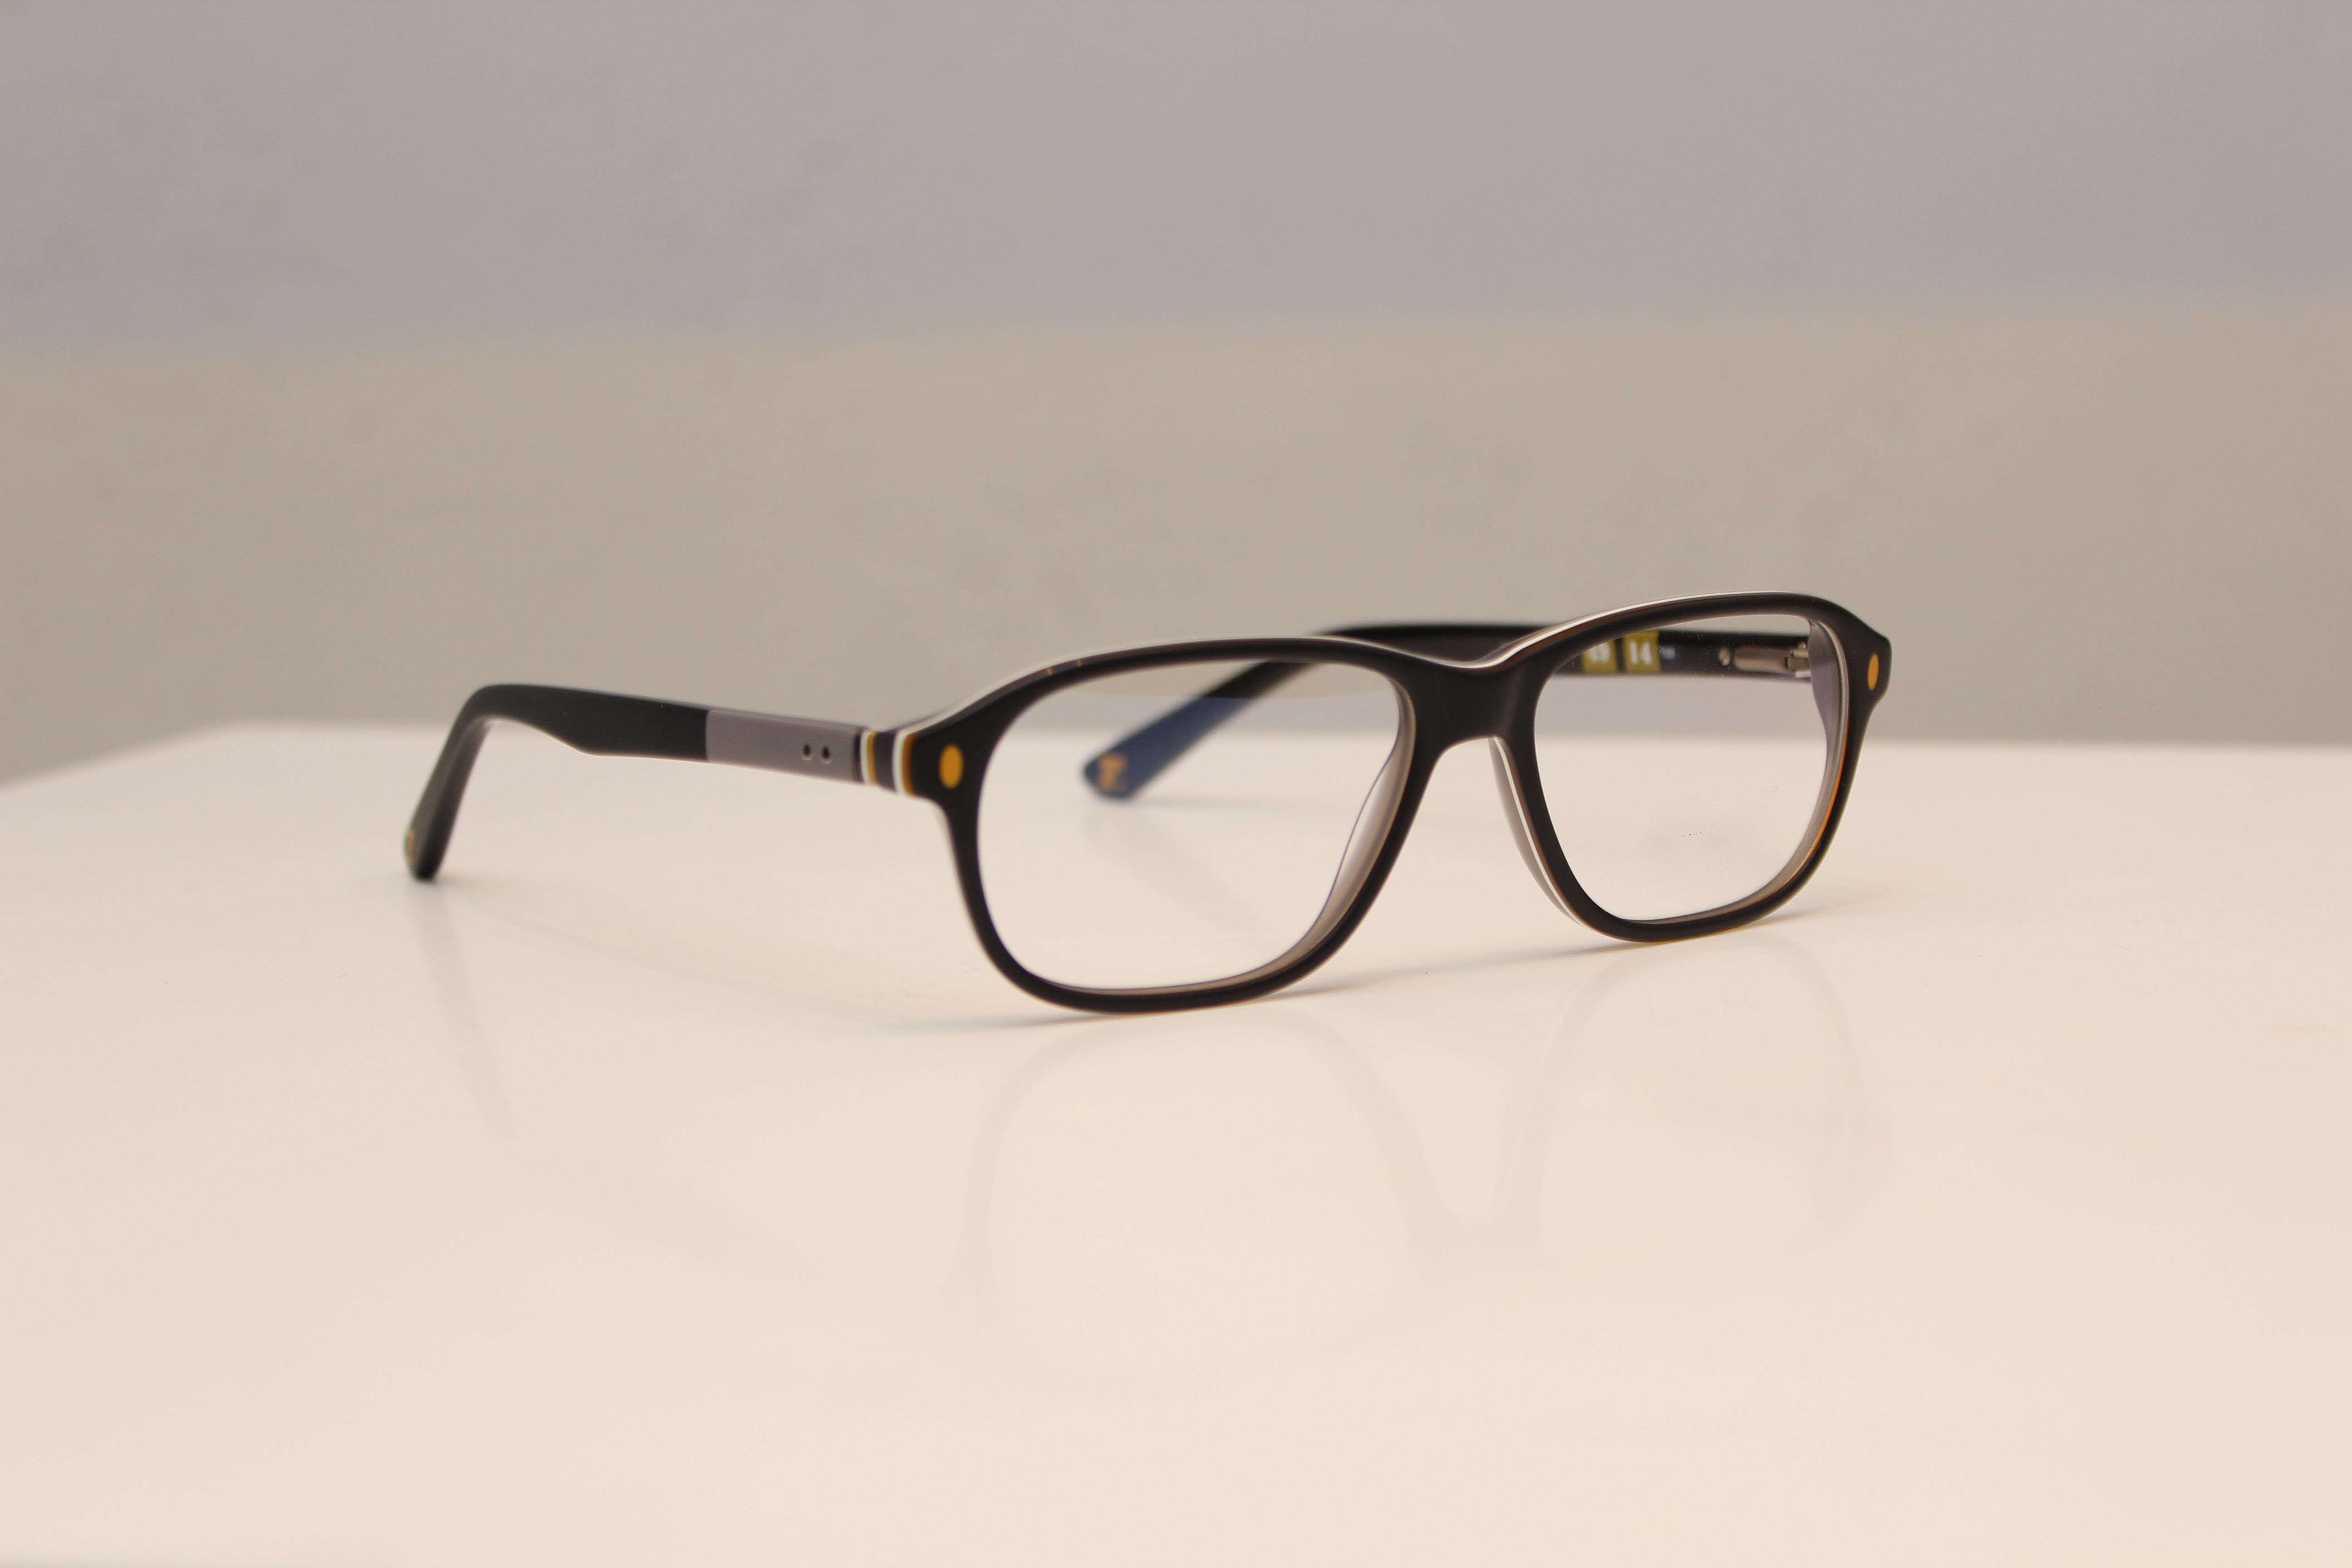 jongensbril